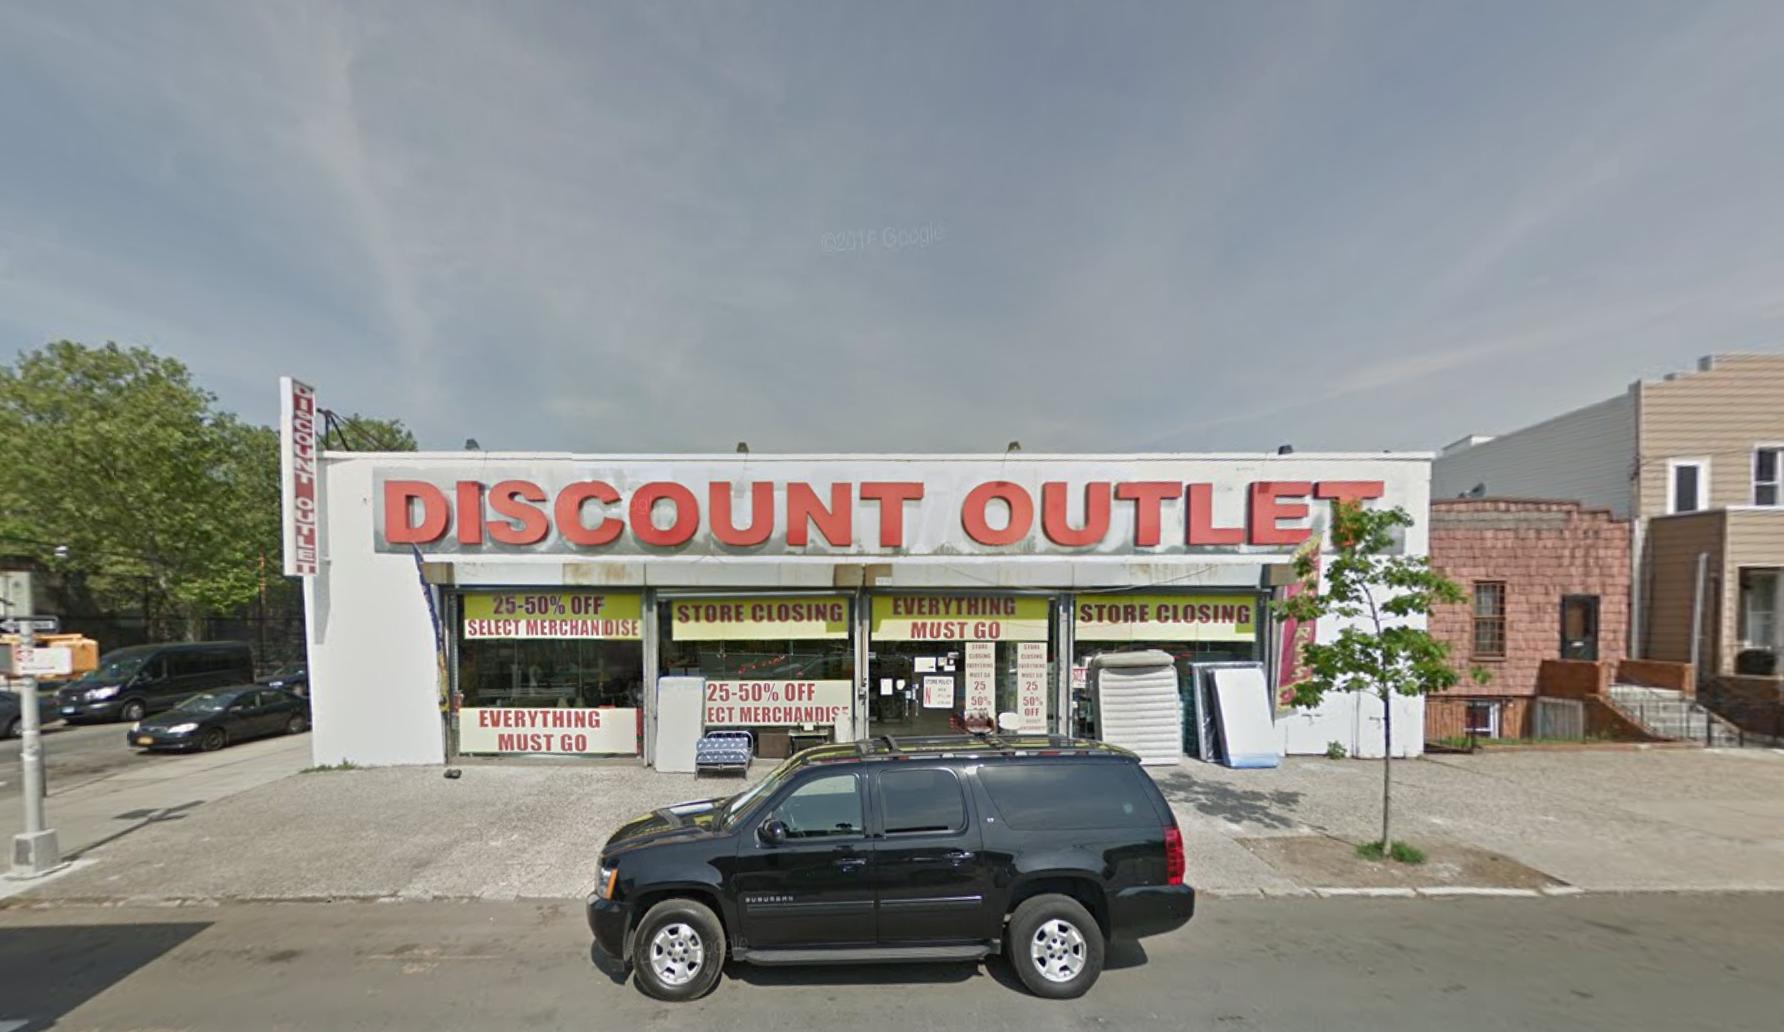 28-16 21st Street, image via Google Maps